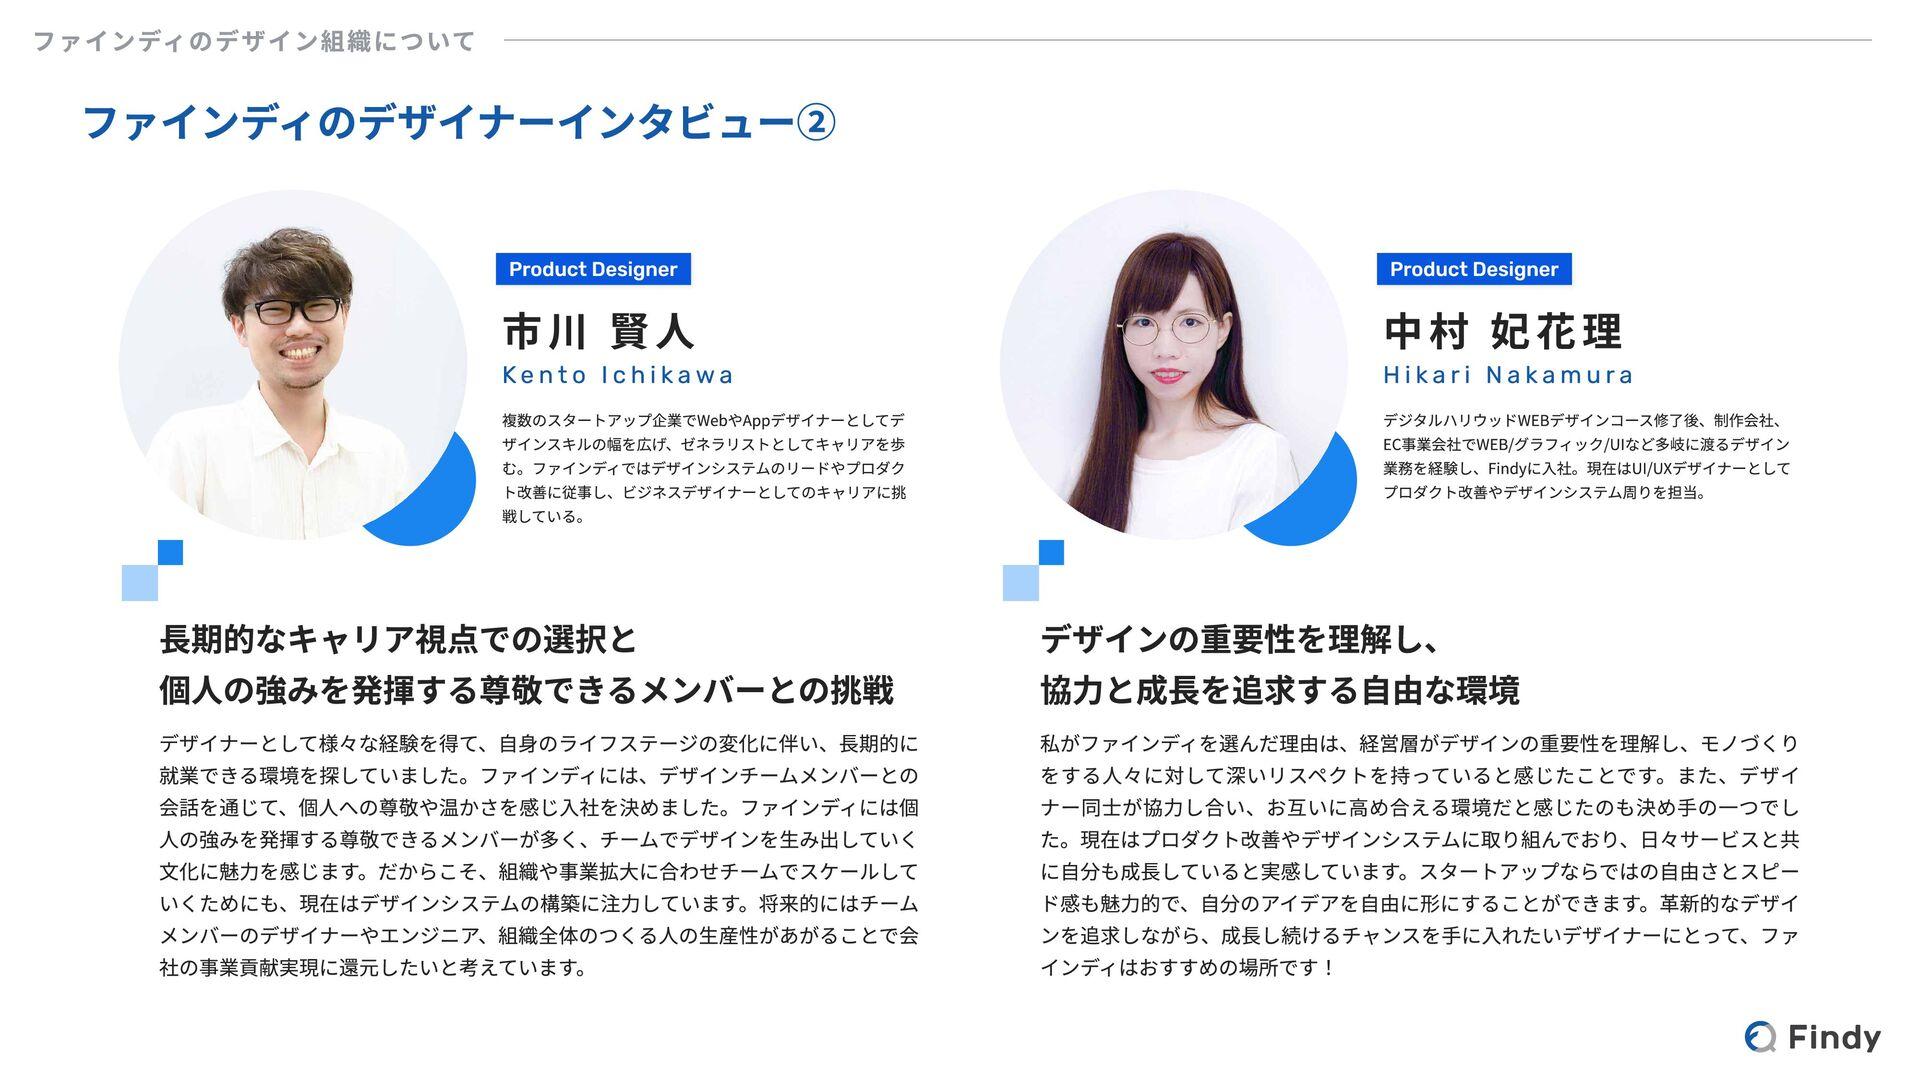 Design Flow 業務のフロー ϨϏϡʔ ґཔ ώΞϦϯά ৼΓ͚ εέδϡʔϧ ϫΠ...